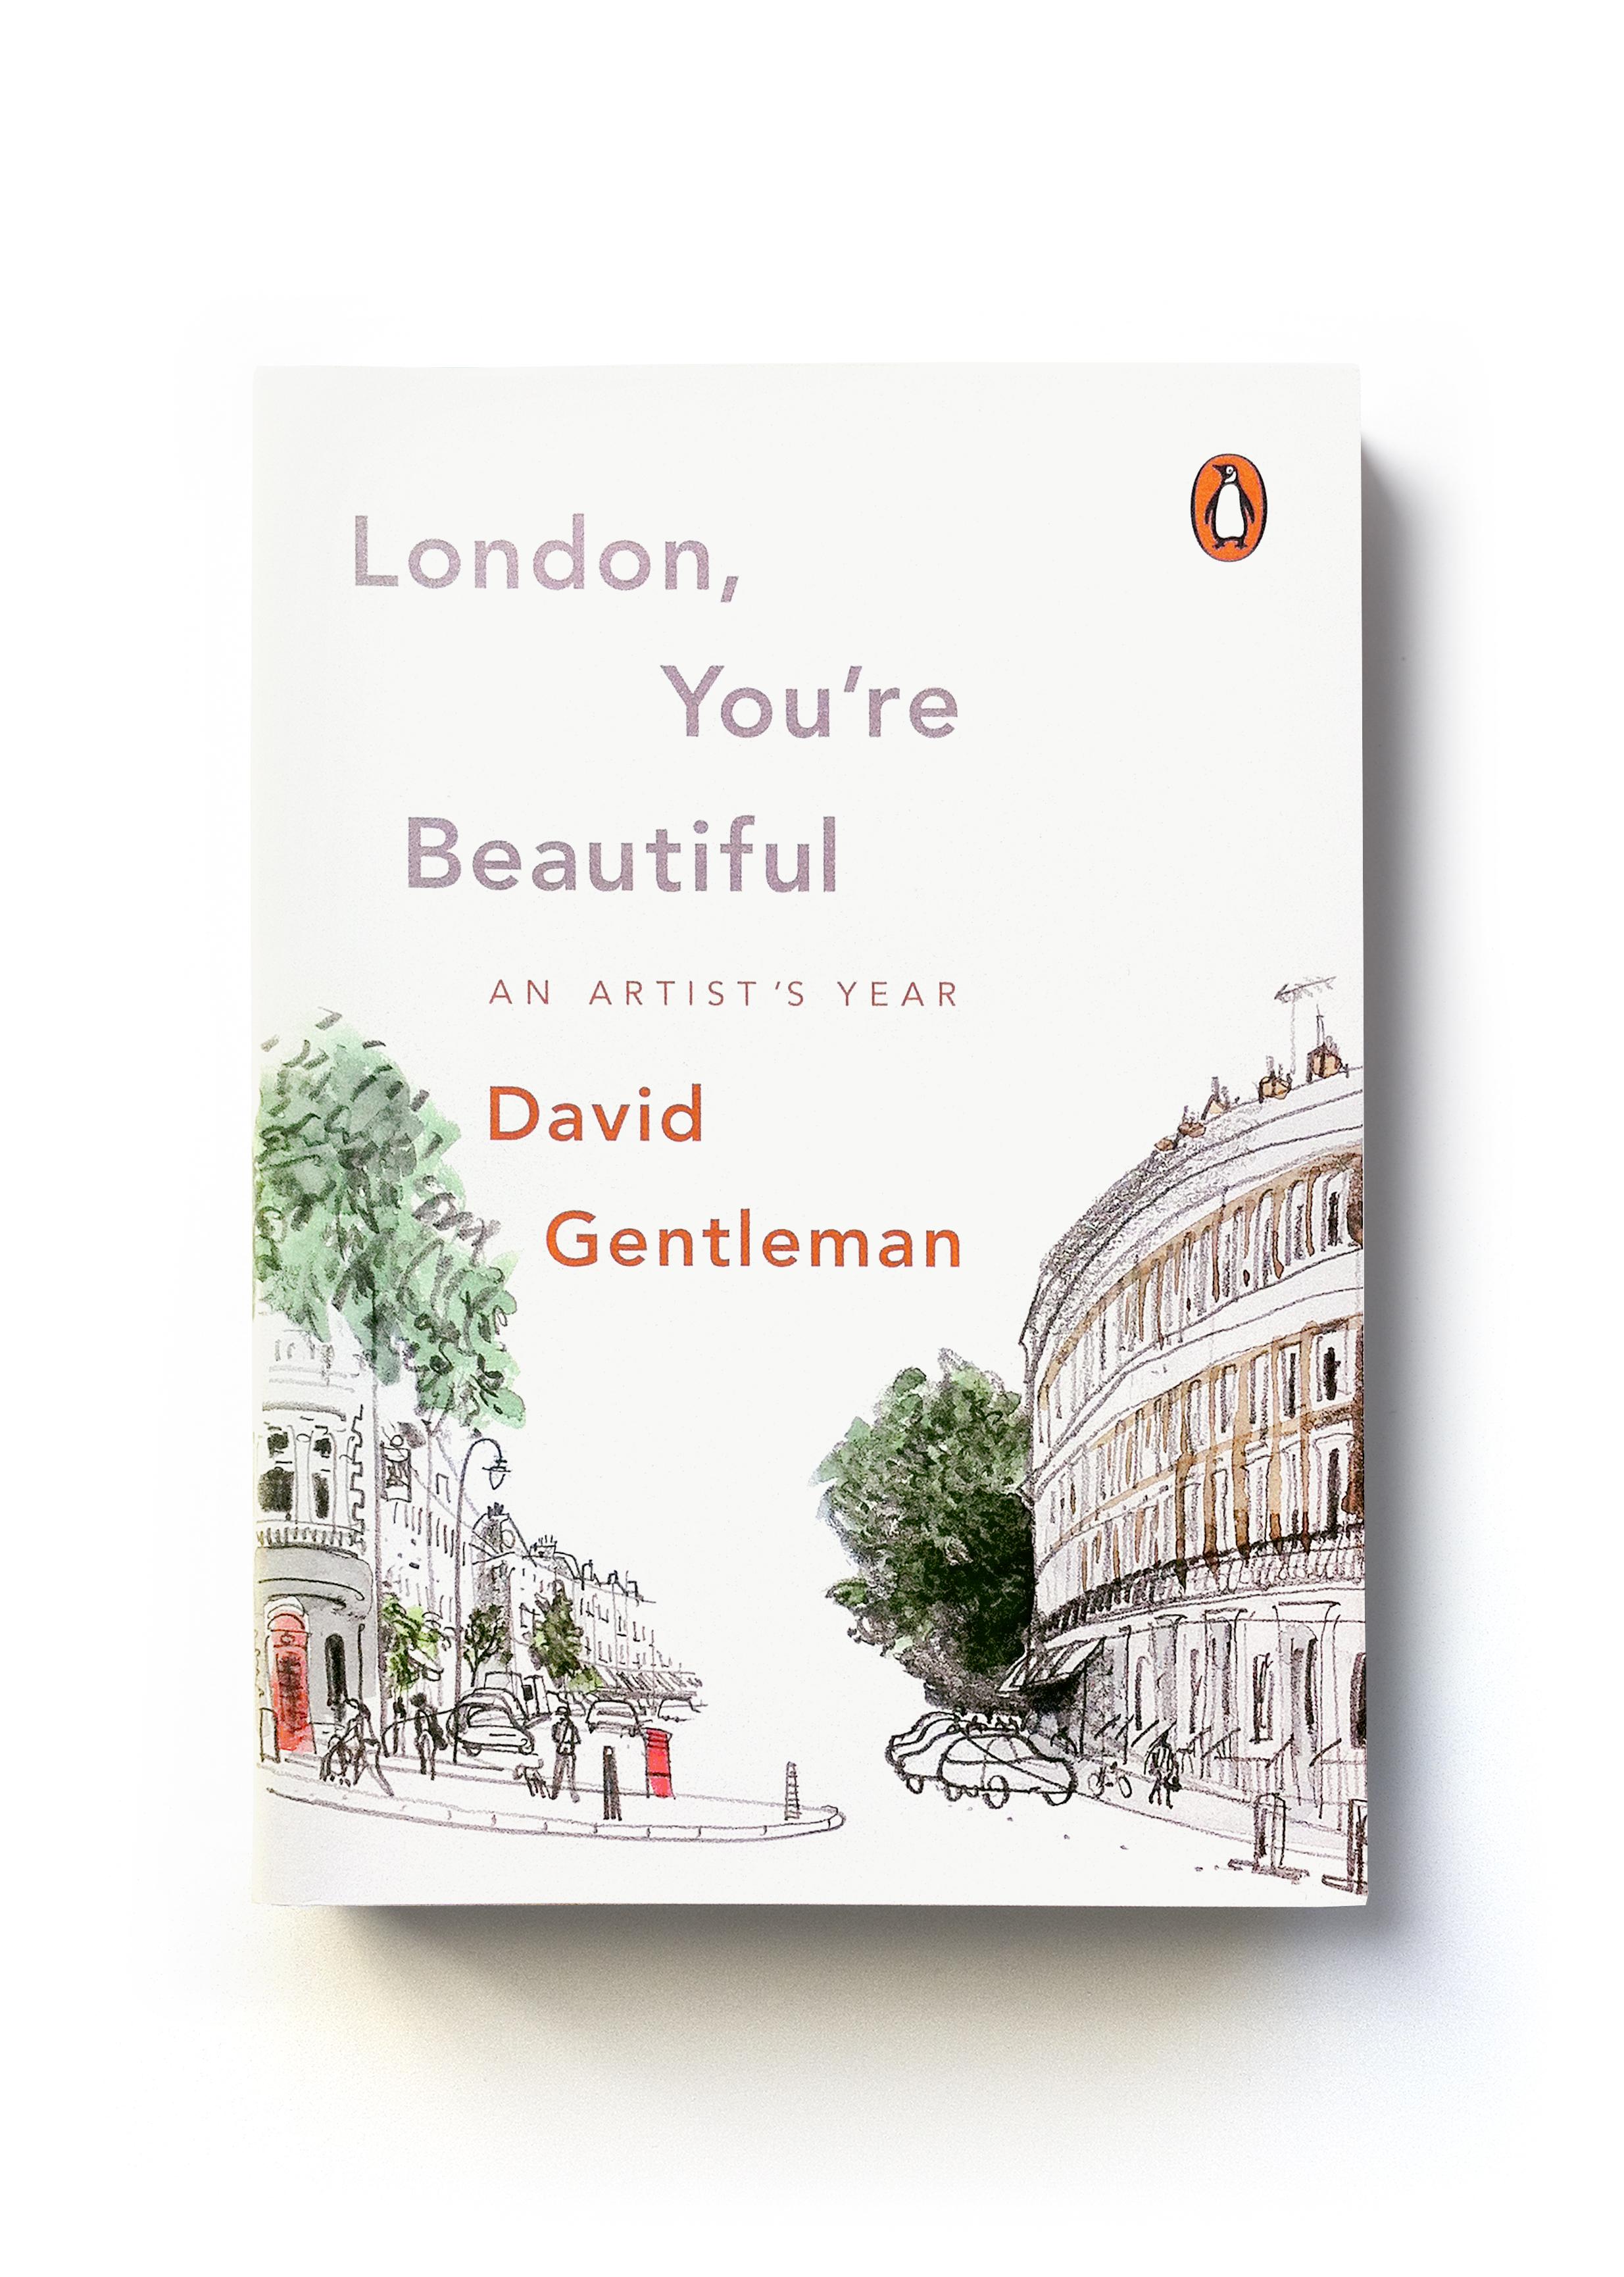 London, You're Beautiful by David Gentleman - Art & words: David Gentleman Art direction: Jim Stoddart